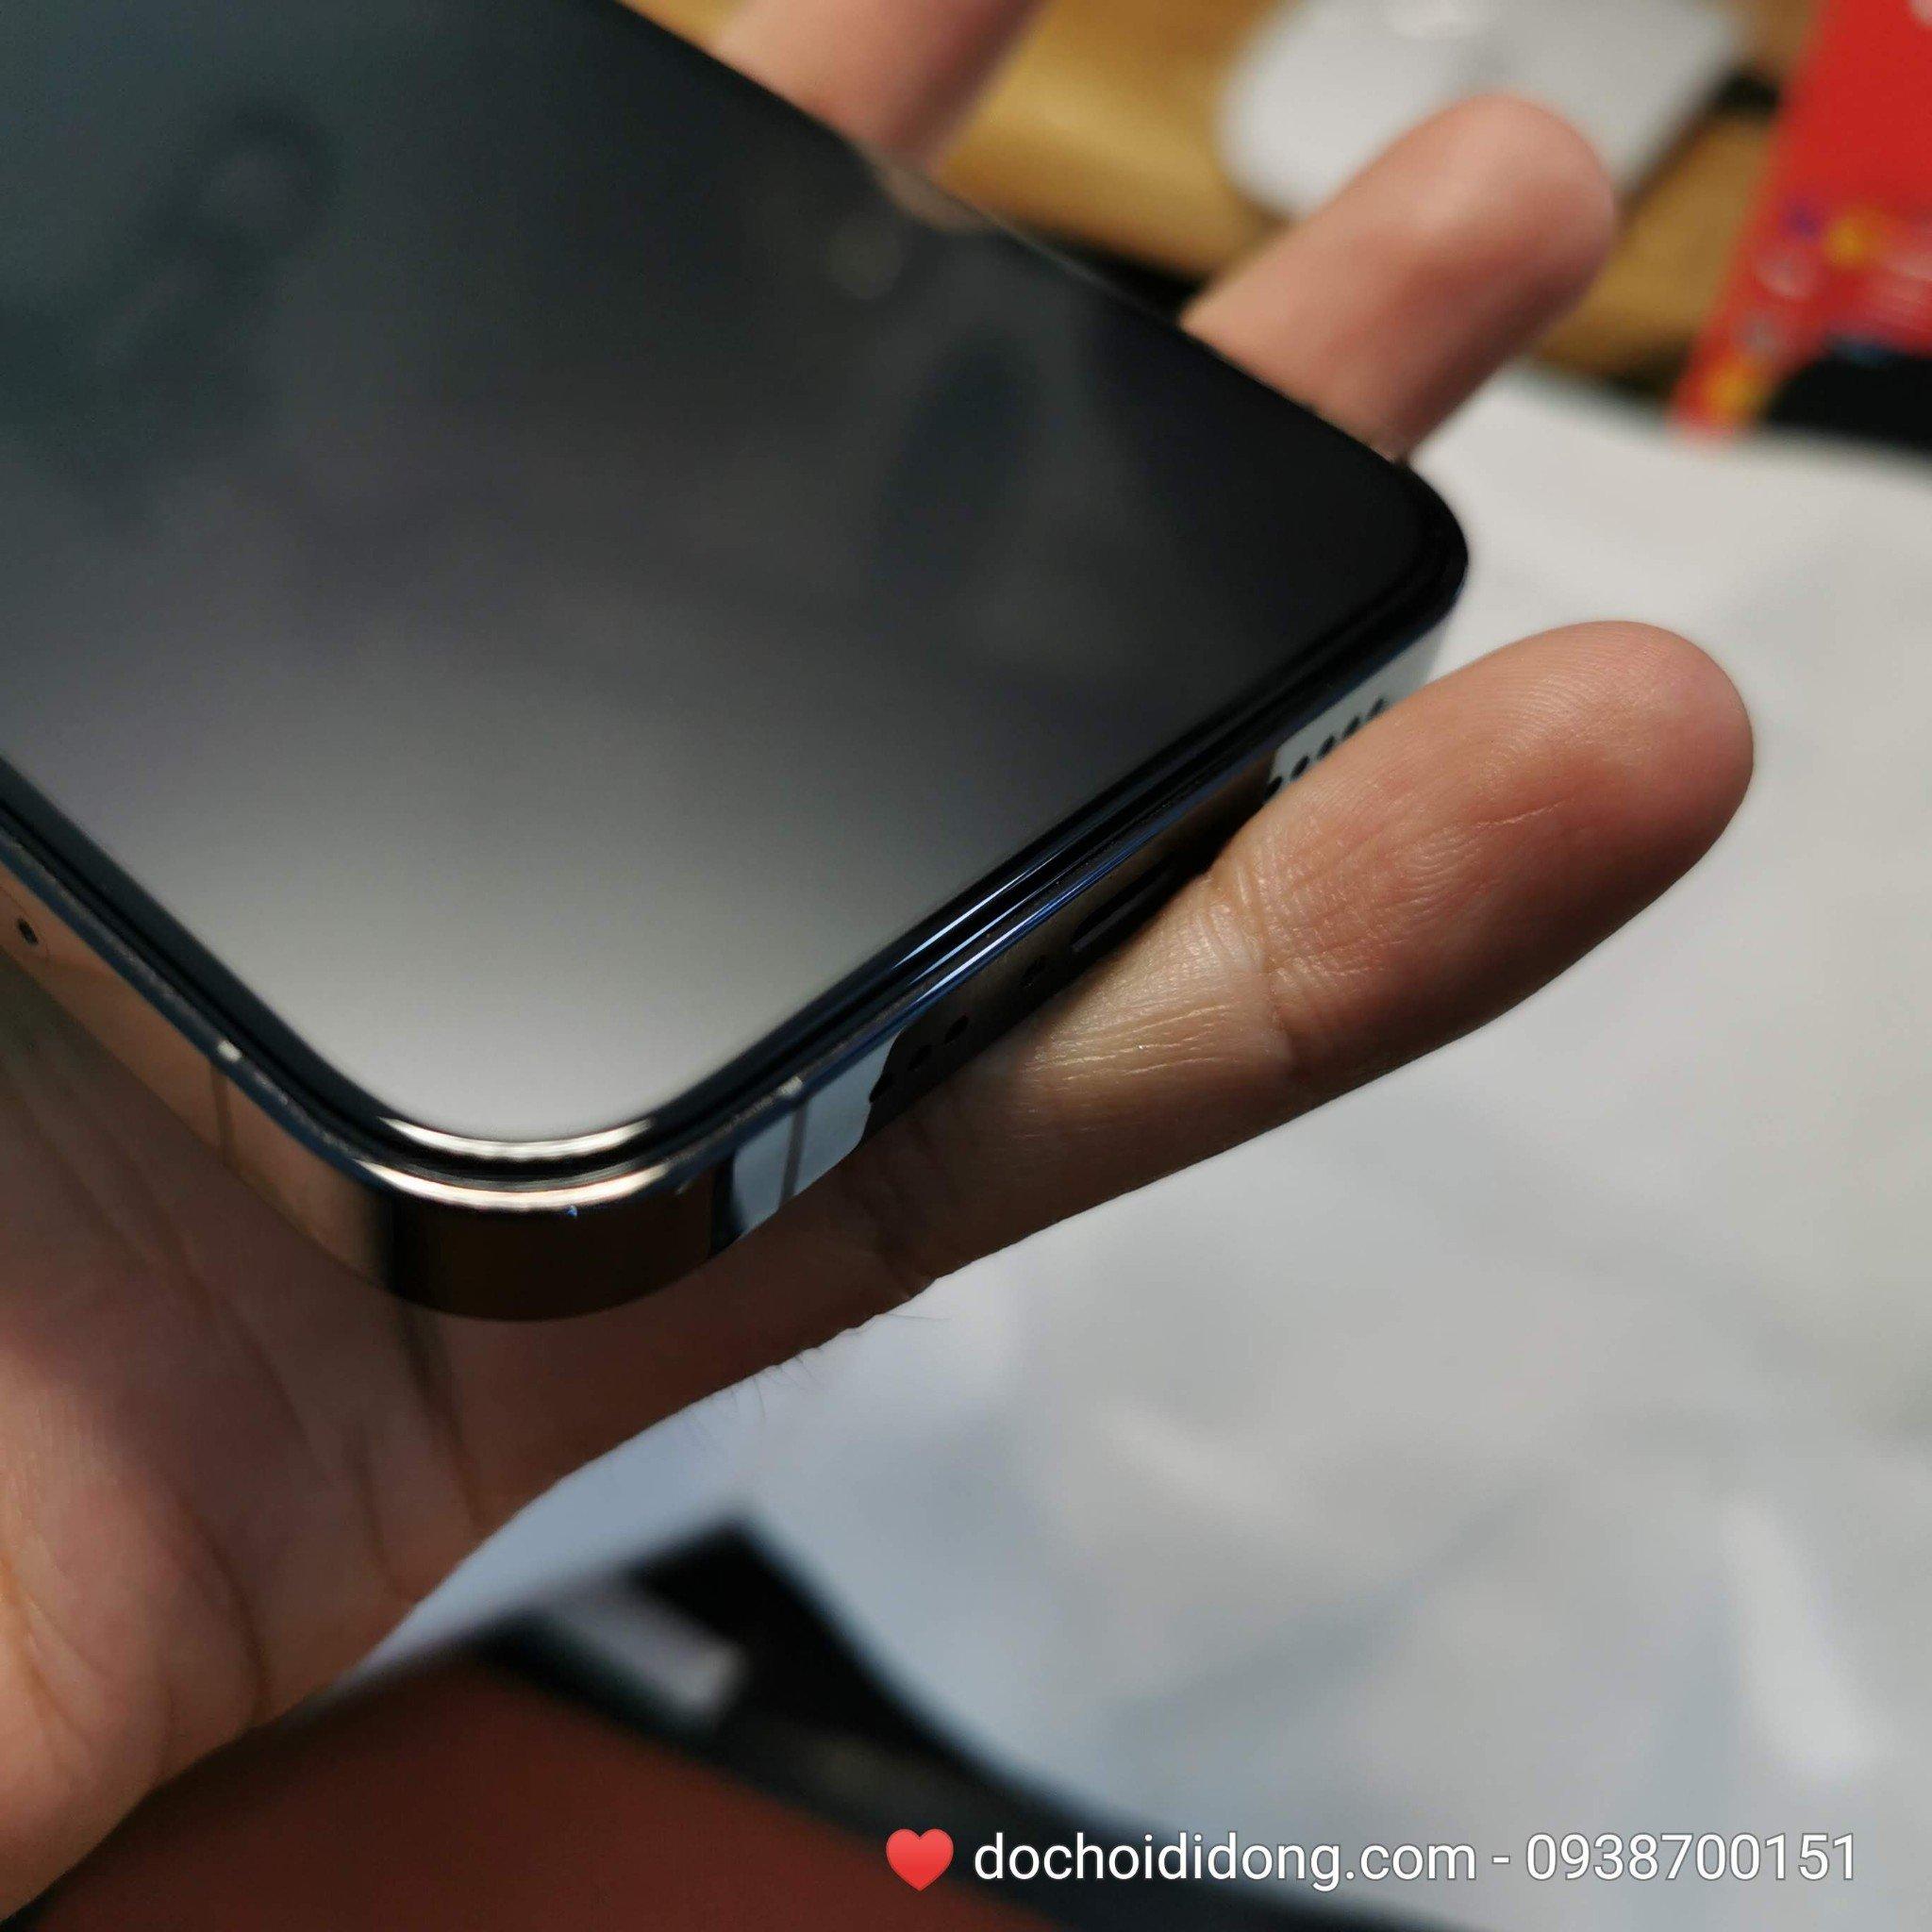 mieng-dan-cuong-luc-nham-iphone-12-pro-max-x-xs-xr-11-pro-max-mipow-king-bull-hd-anti-glare-full-man-hinh